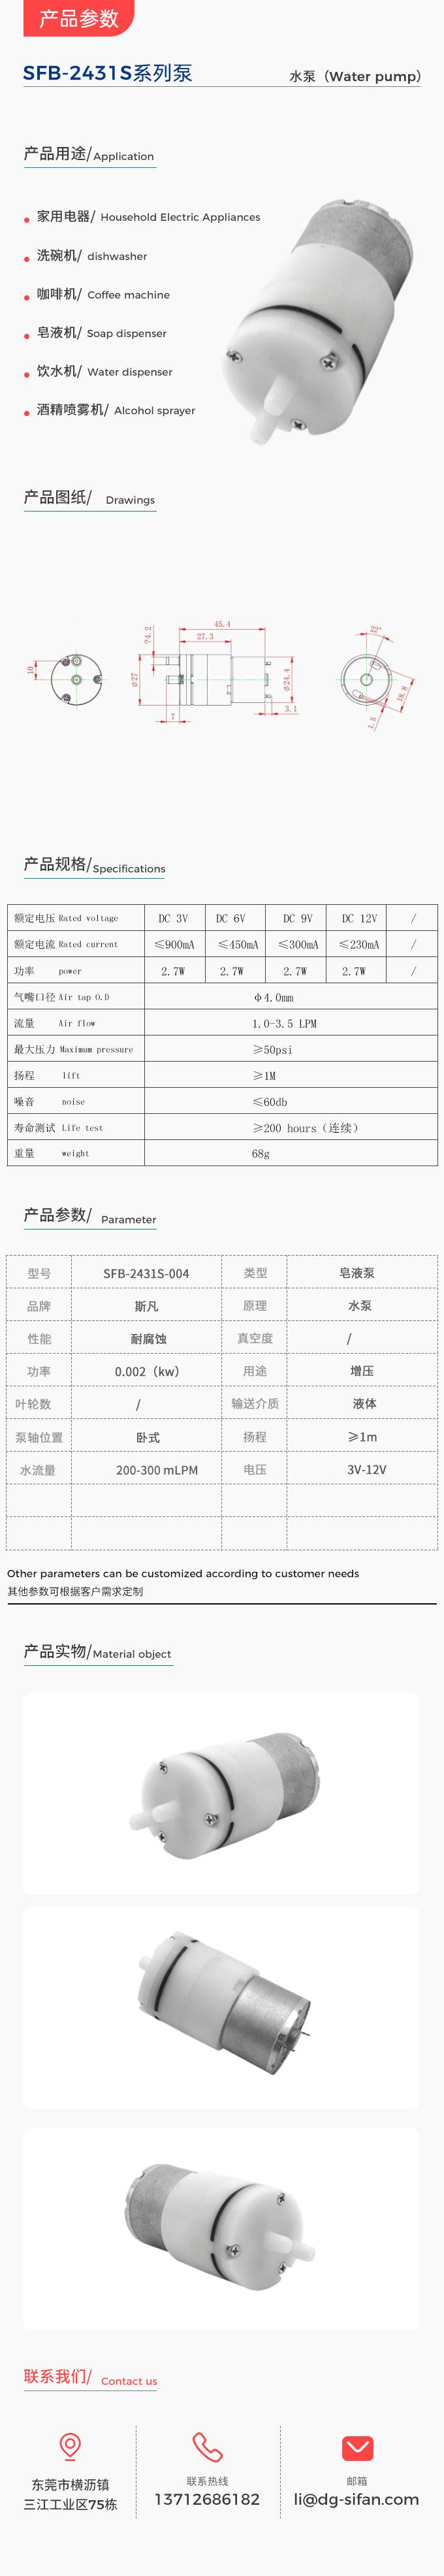 SFB-2431S-004.jpg